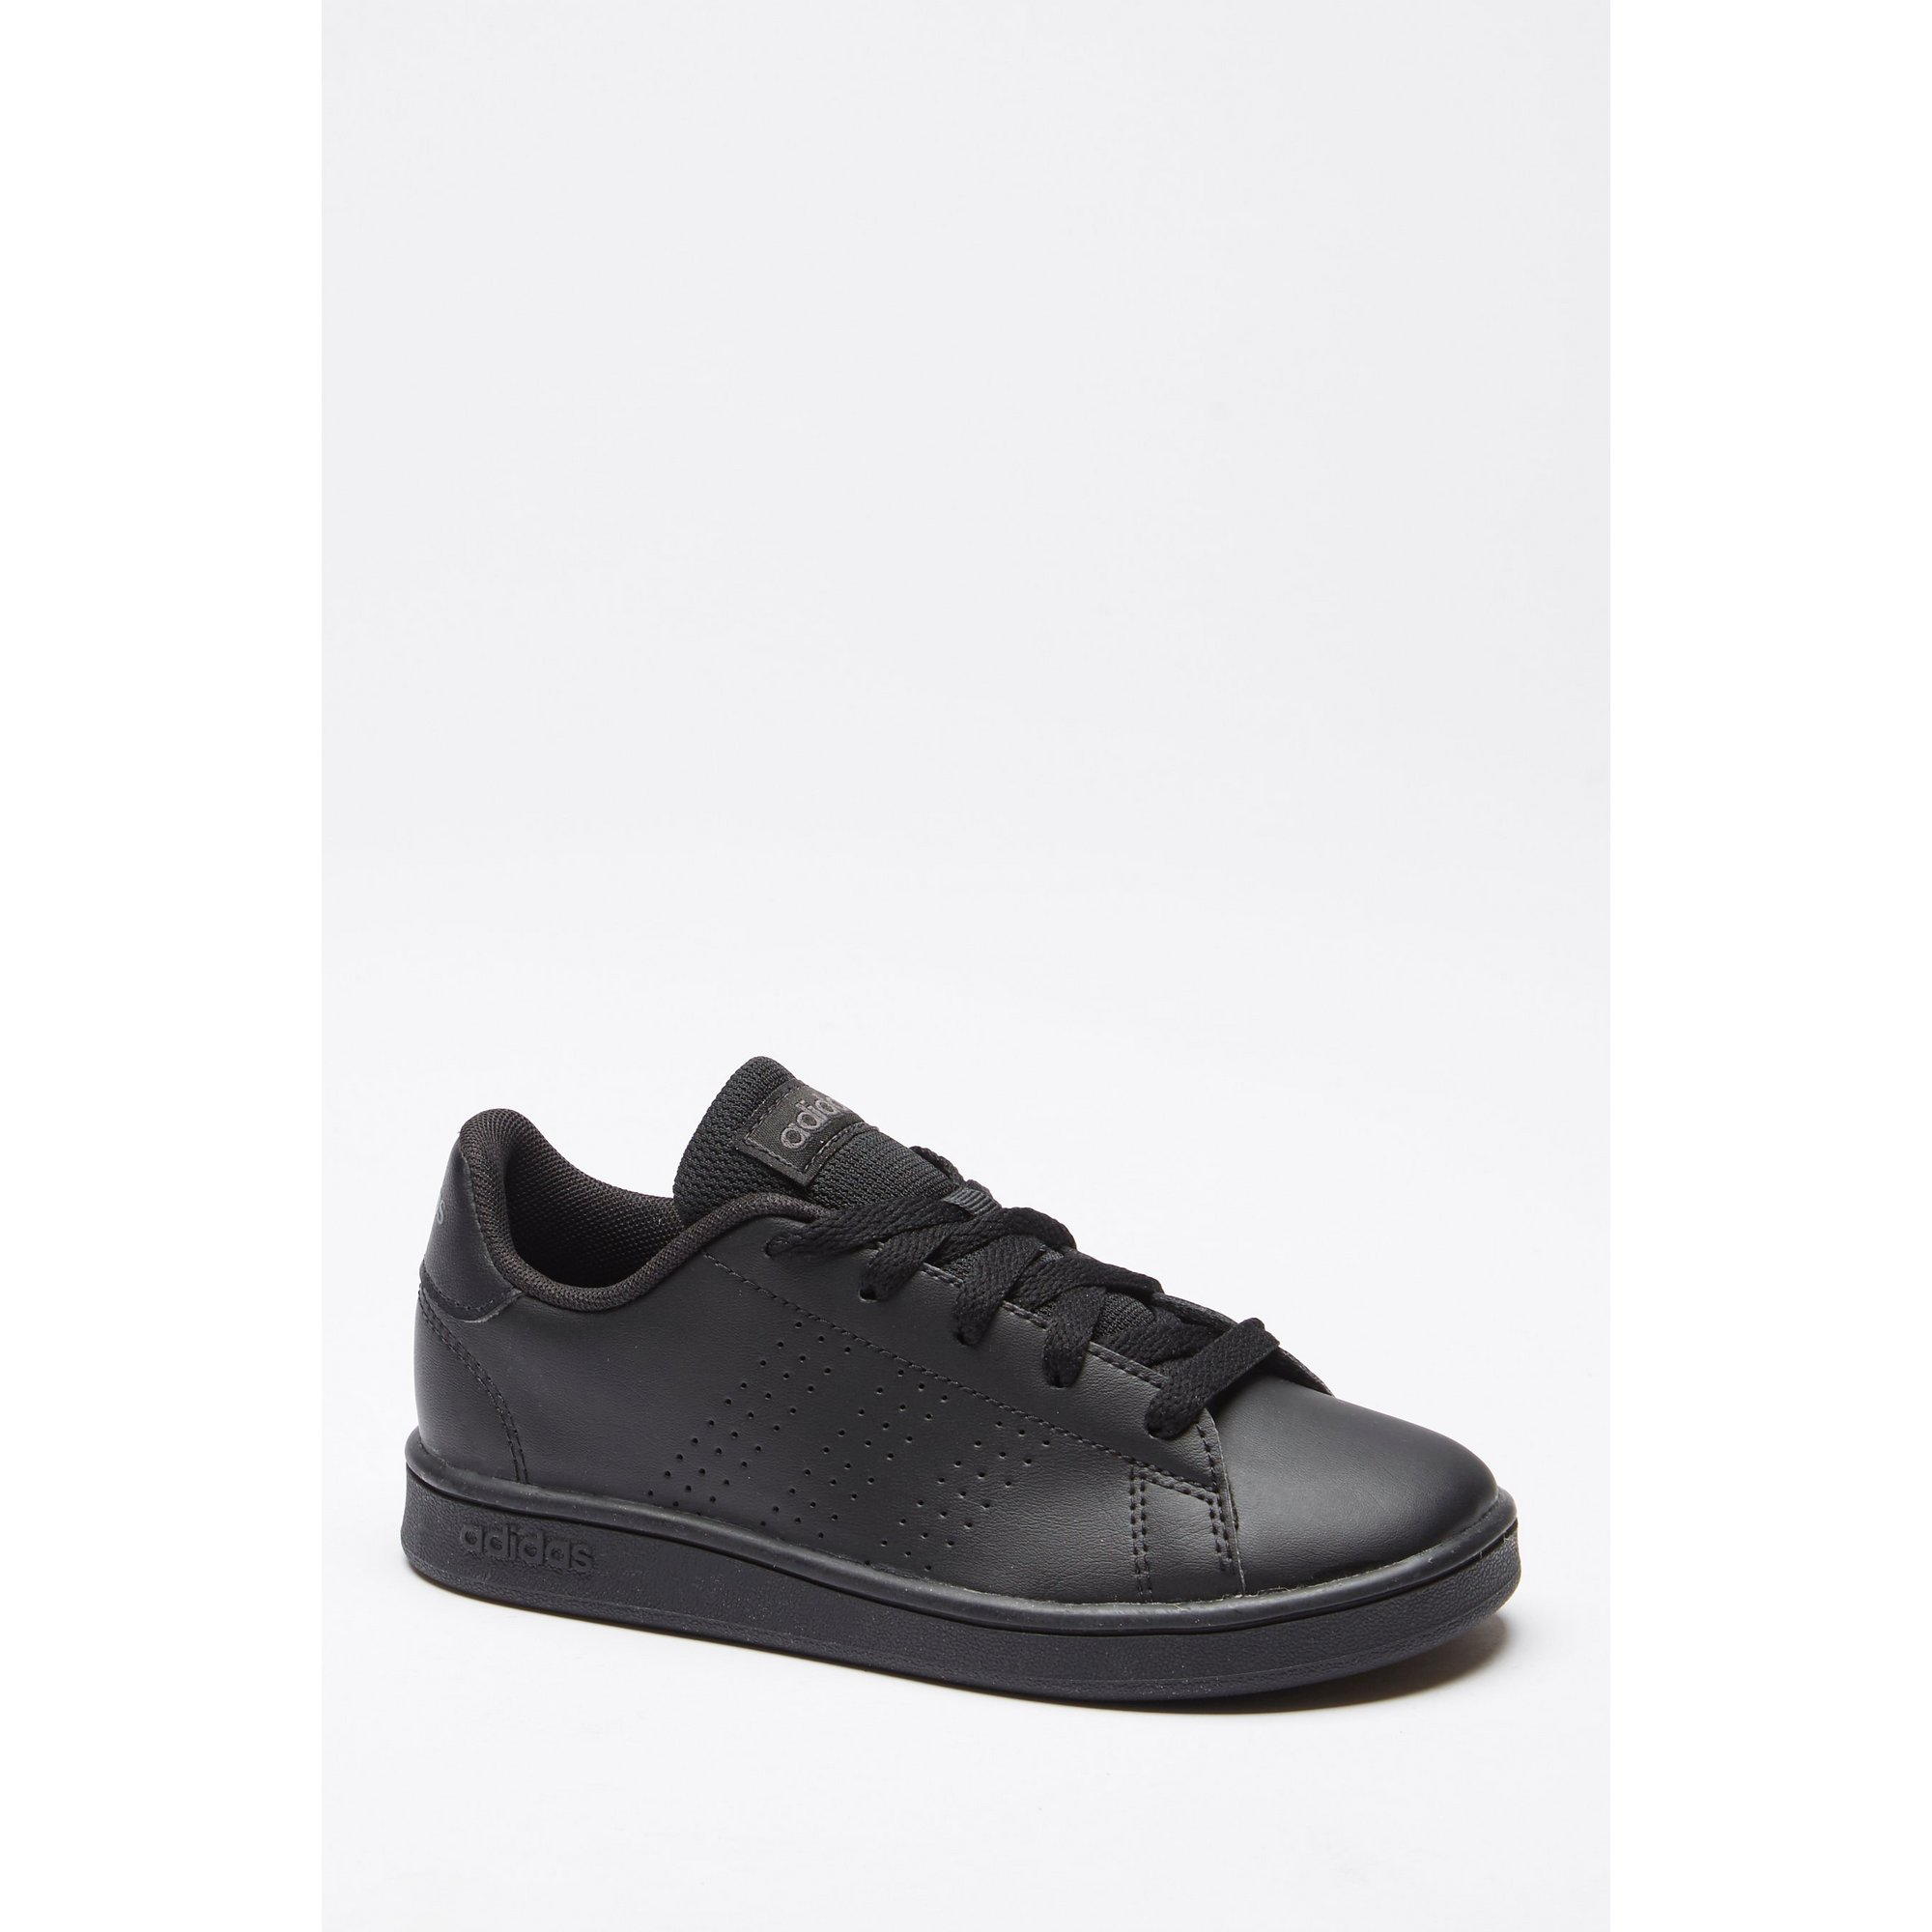 Image of adidas Advantage Black Junior Trainers